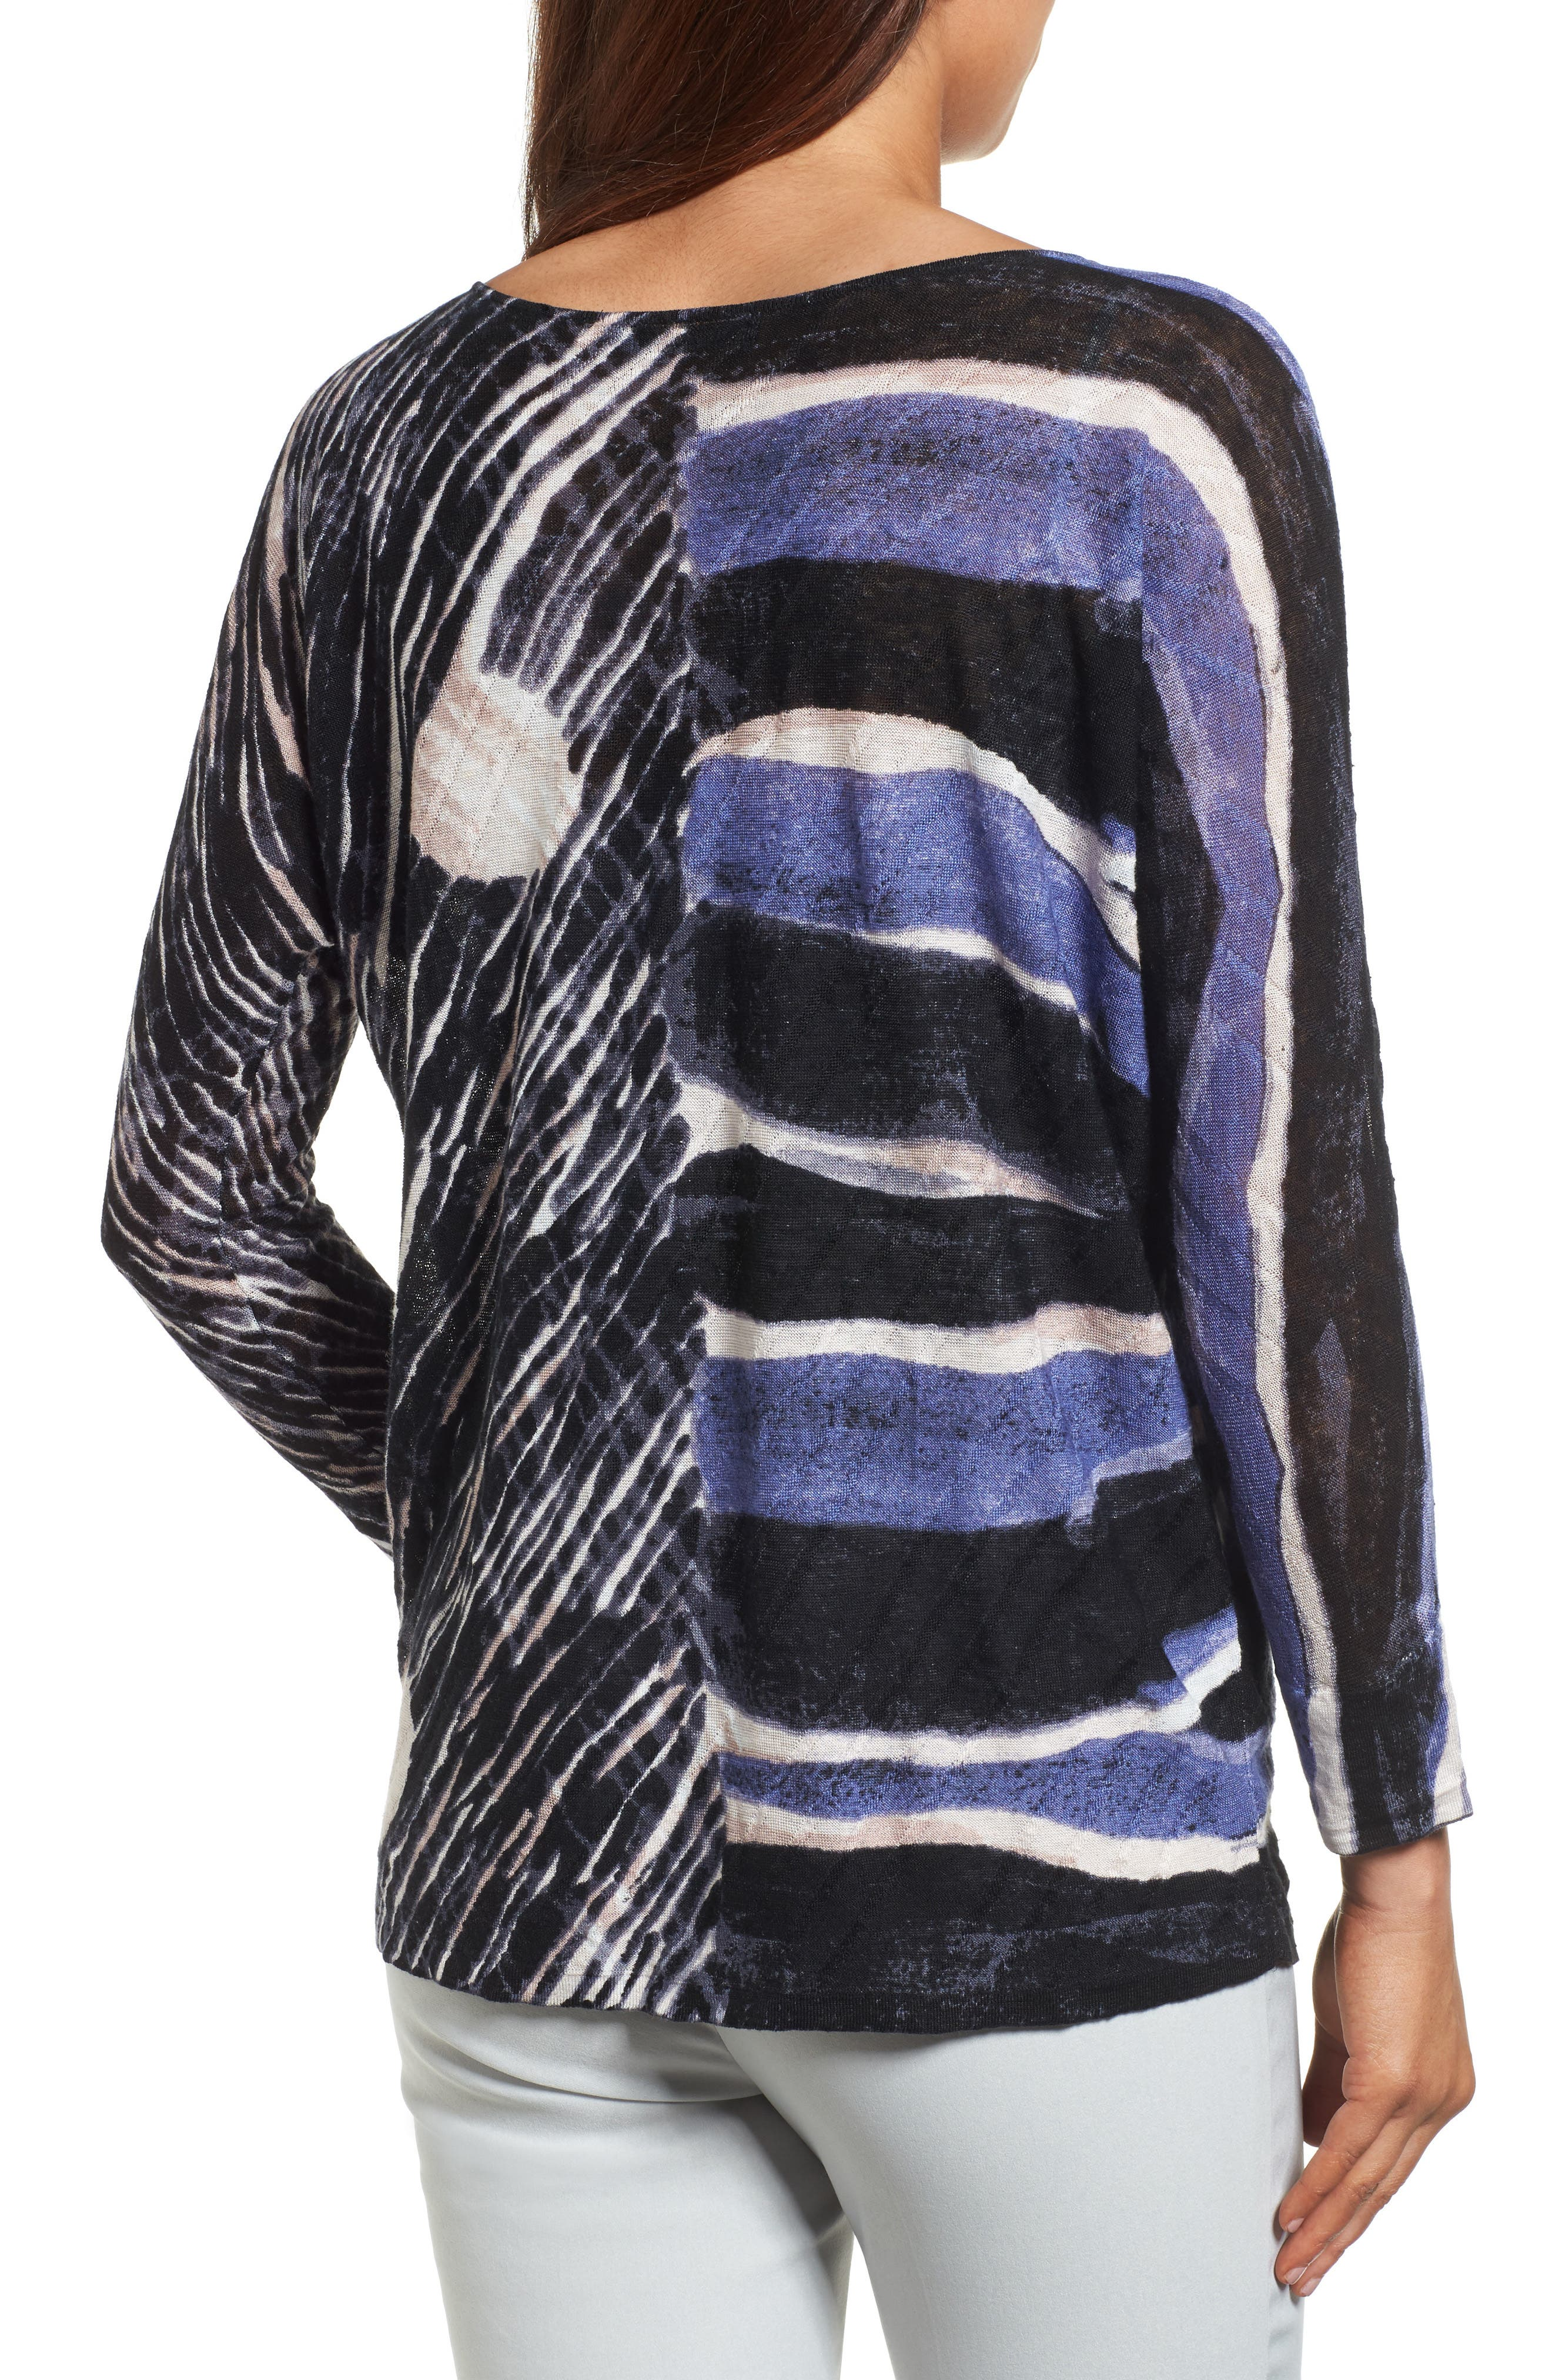 Sierra Sweater,                             Alternate thumbnail 2, color,                             490